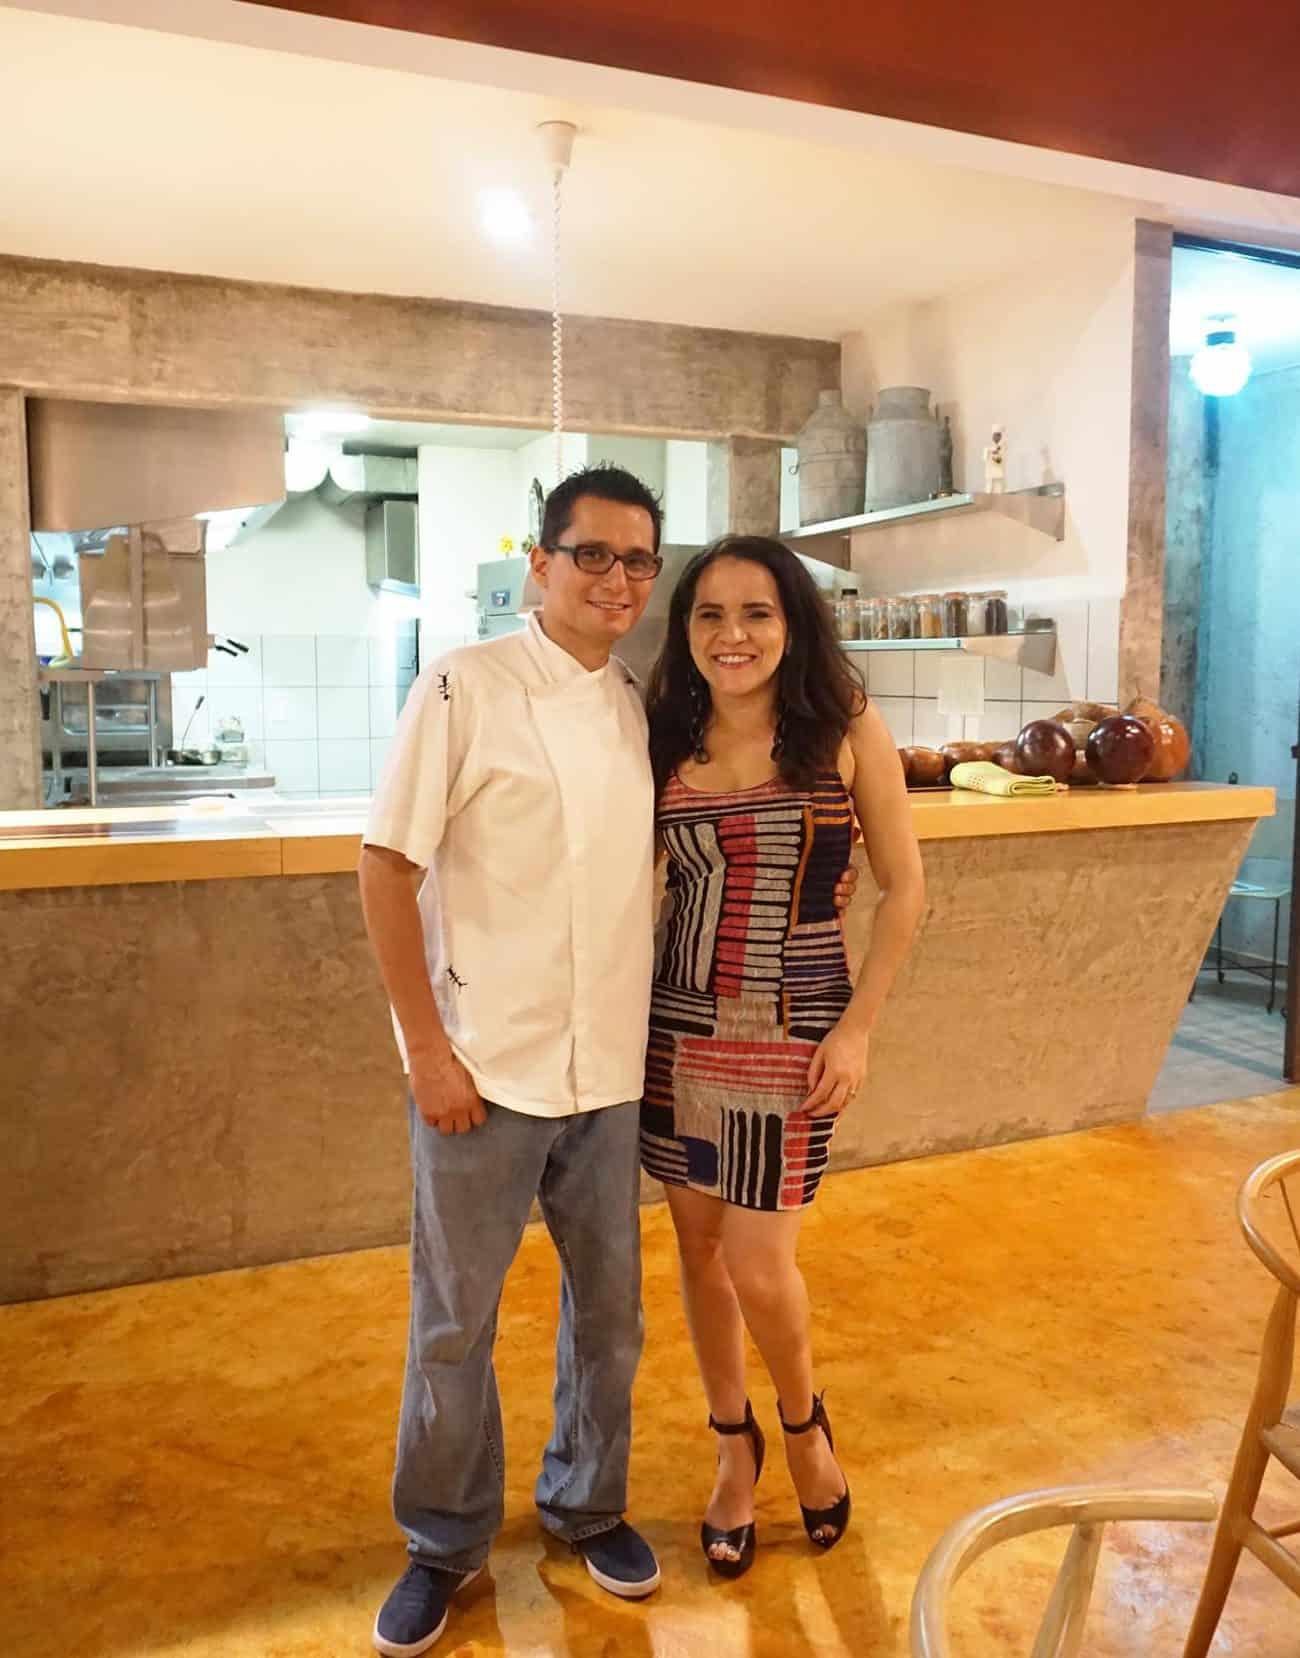 Axiote-Playa-del-carmen-iron-chef-xavier-perez-stone